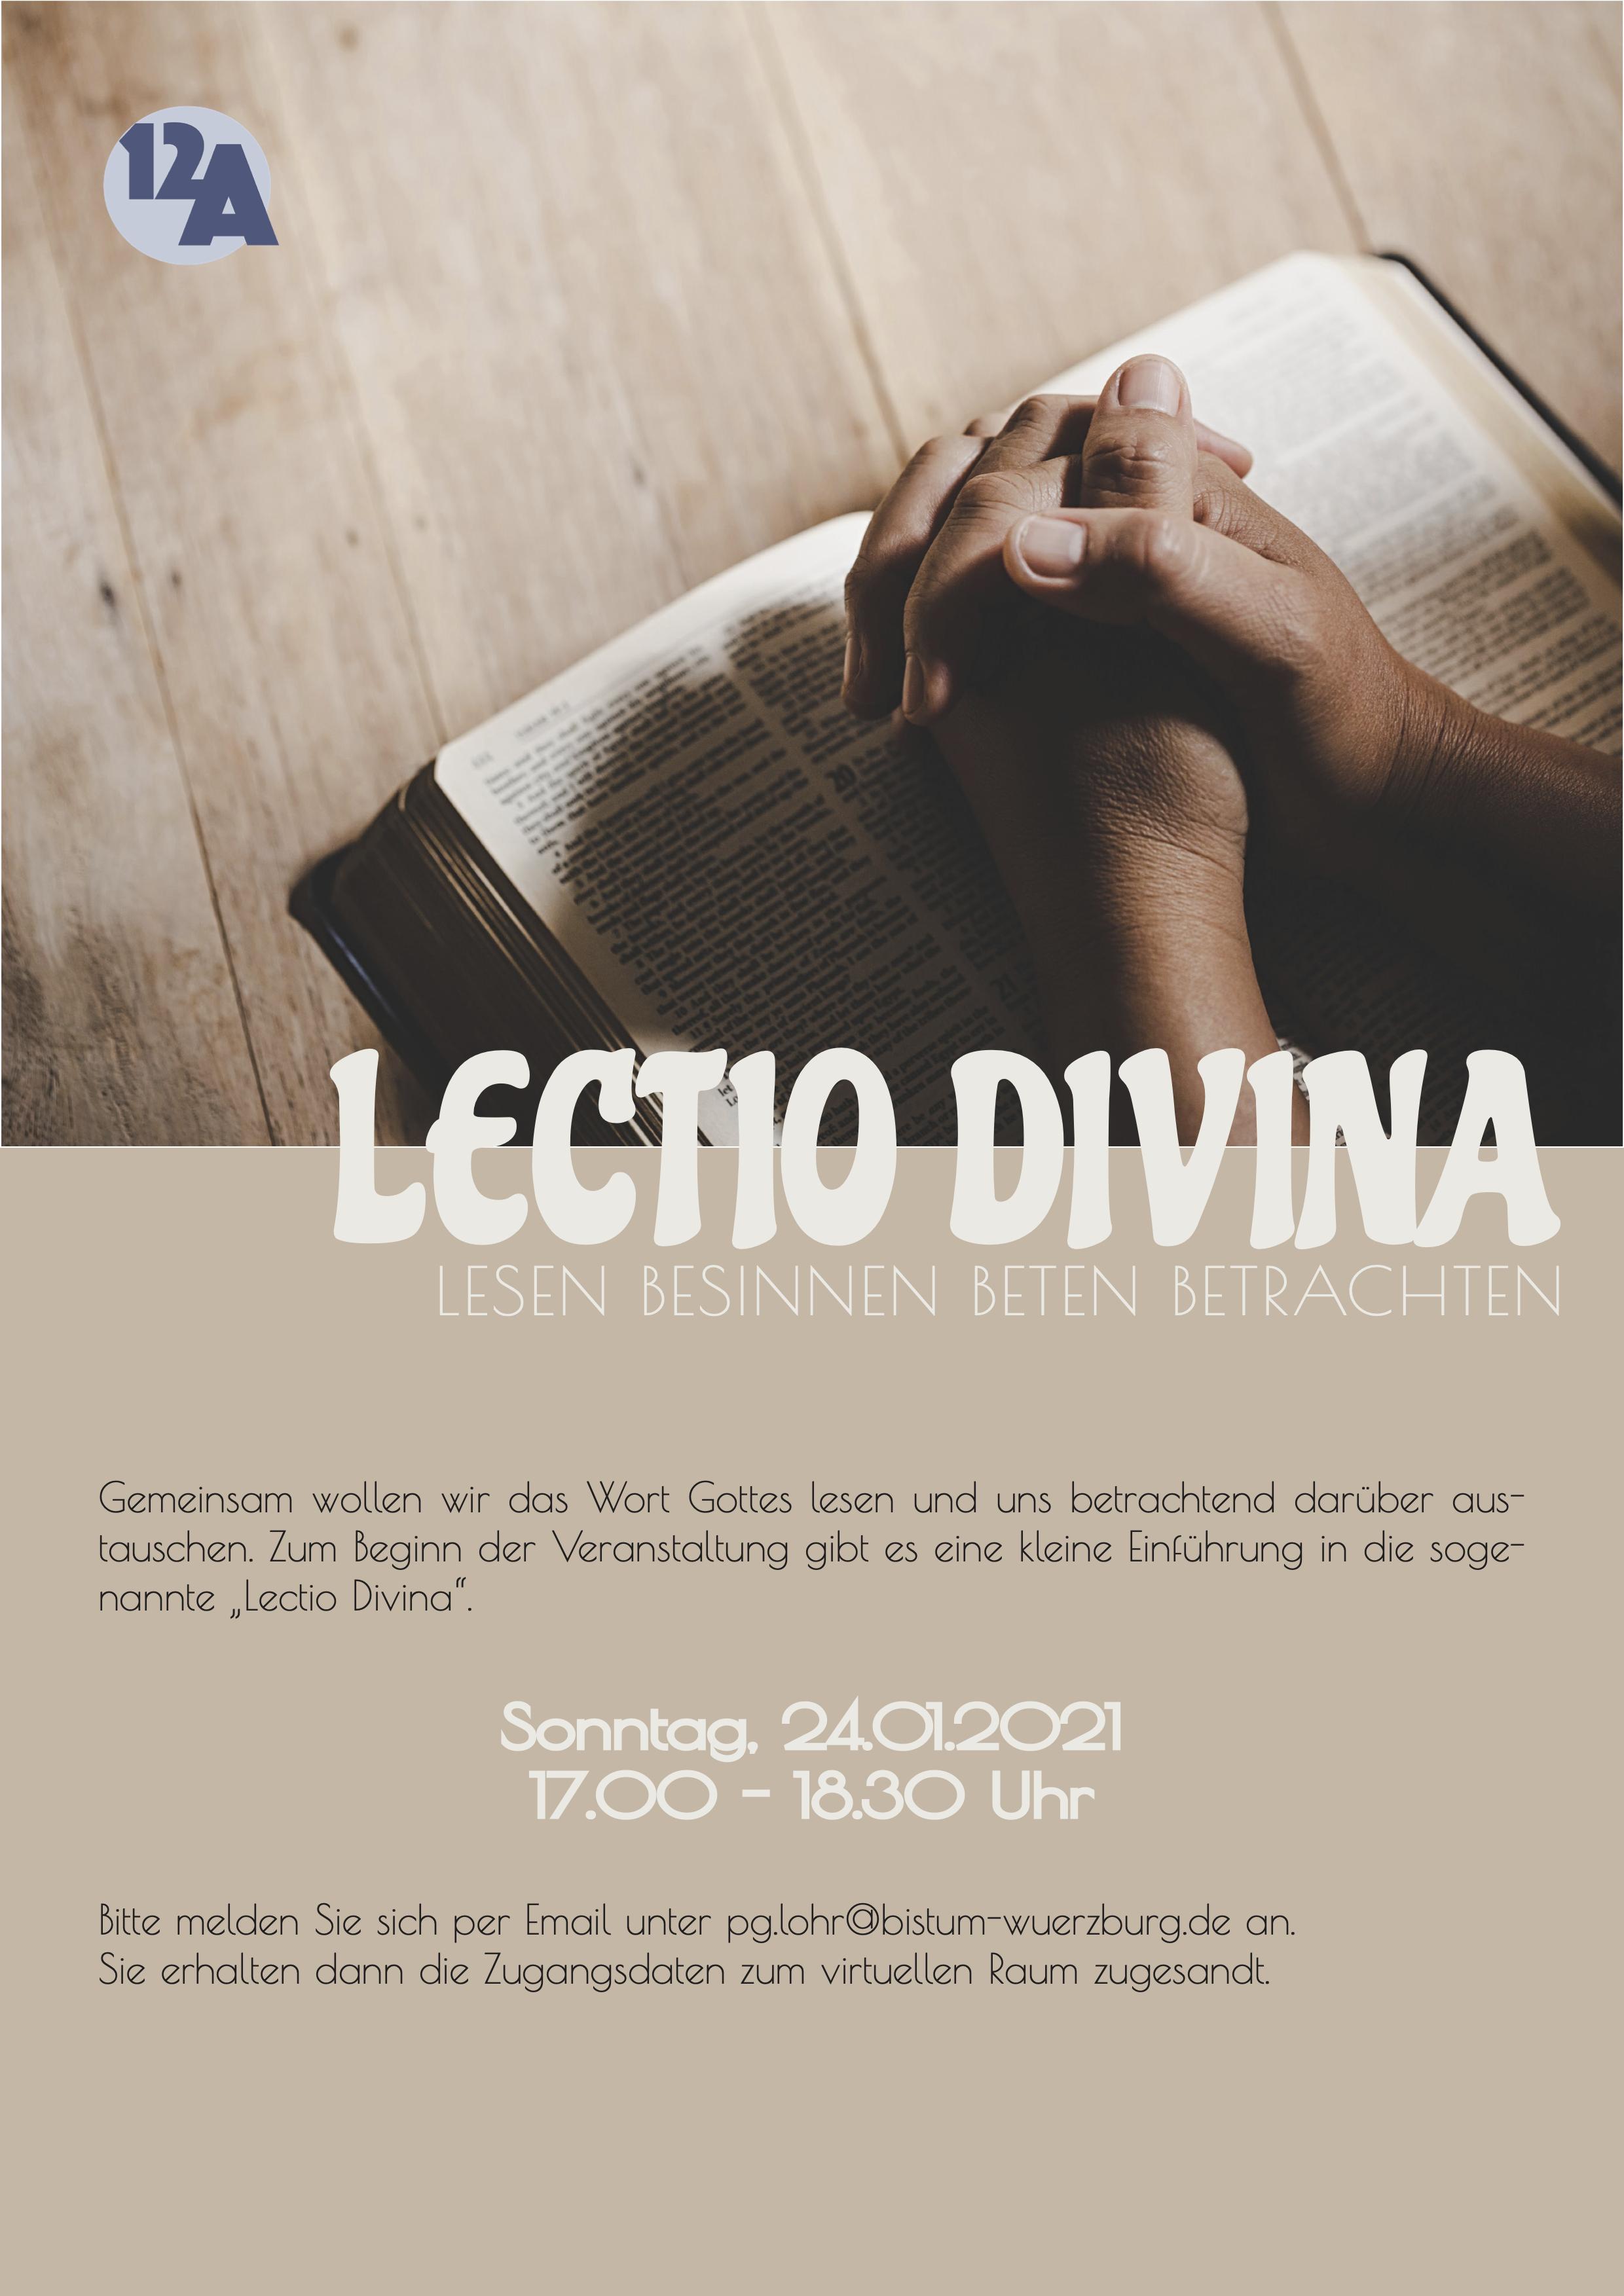 Lectio Divina - Lesen, Besinnen, Beten, Betrachten